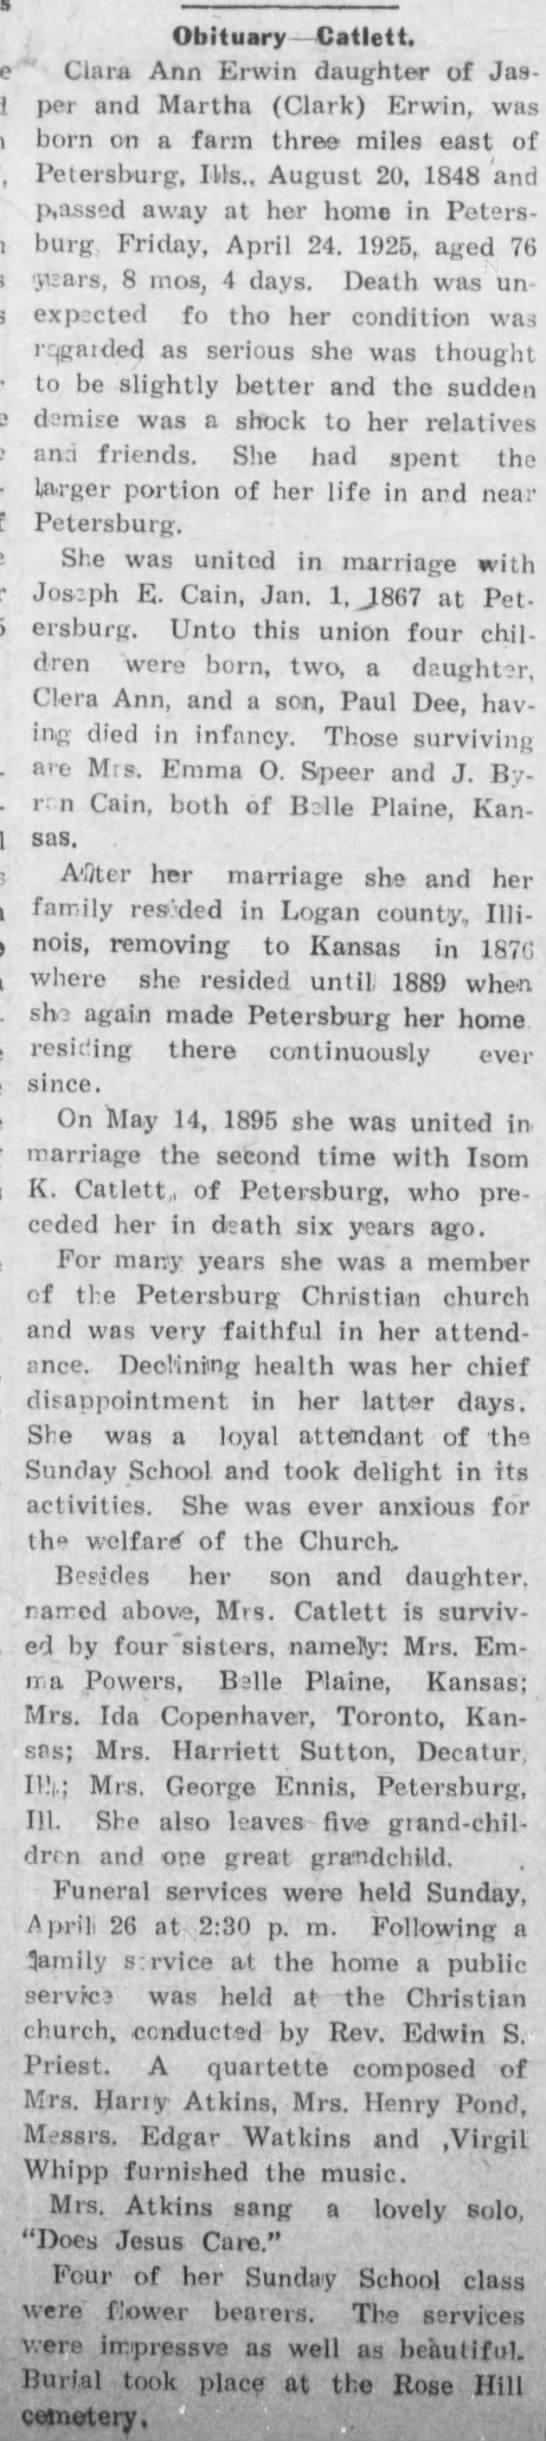 Clarissa Ann Erwin Cain CAtlett  obituary  Belle Plaine News